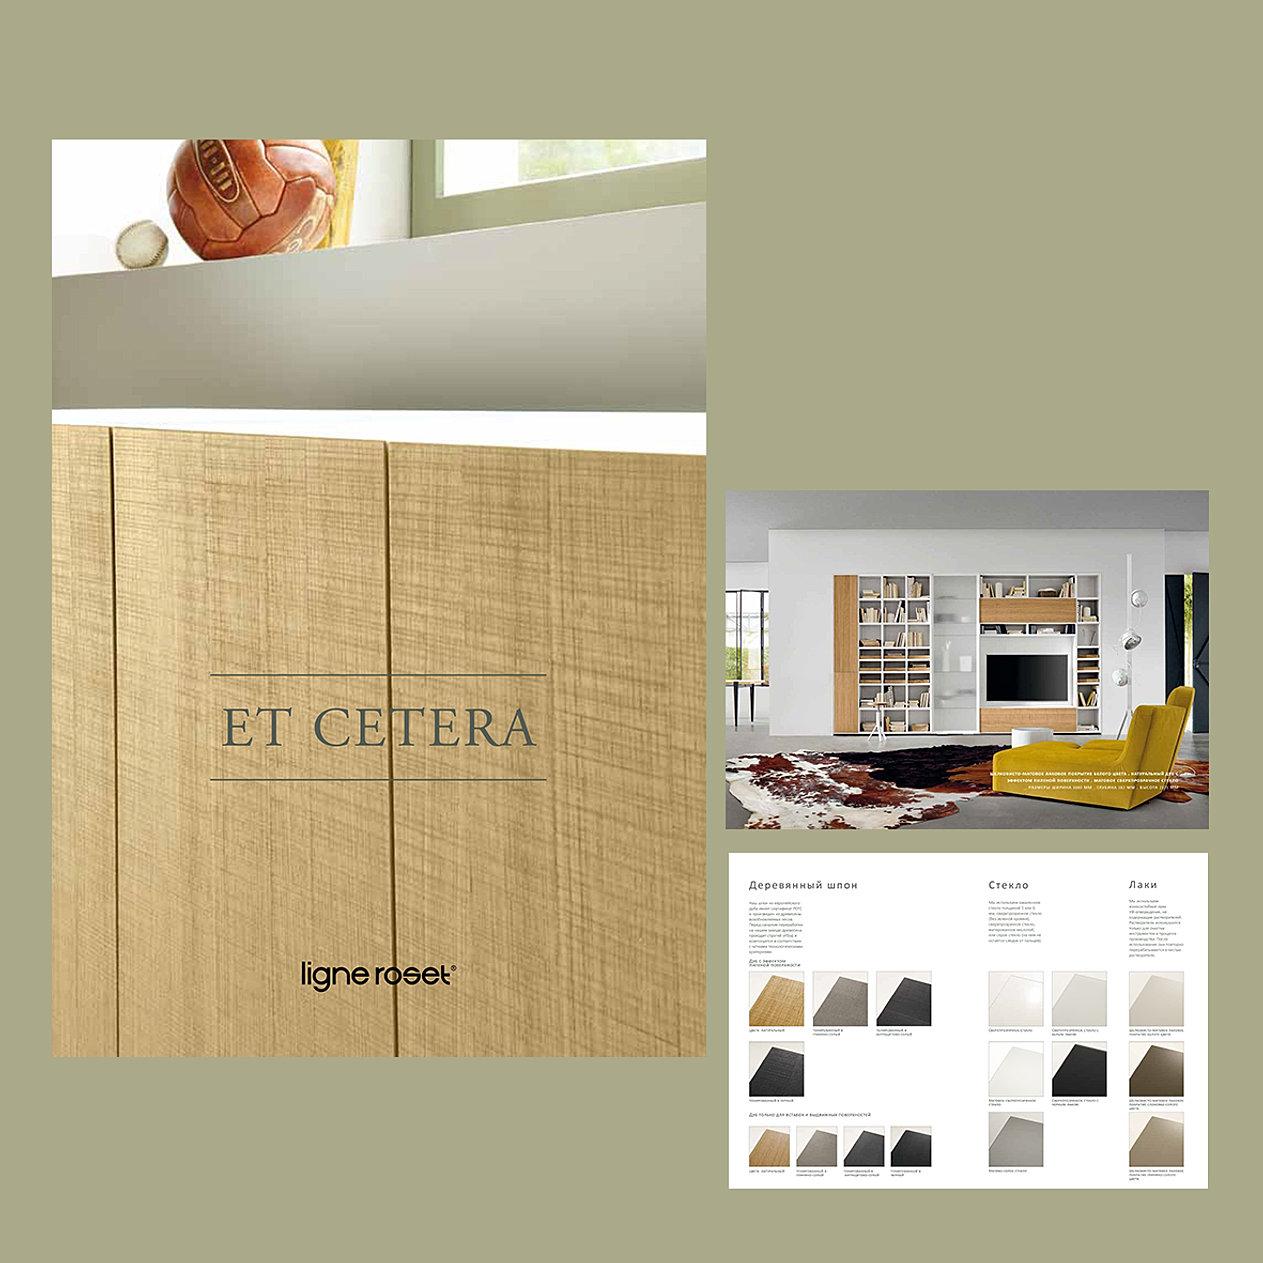 ligne roset grenoble simple pierre with ligne roset grenoble latest couleurs chaudes mobilier. Black Bedroom Furniture Sets. Home Design Ideas